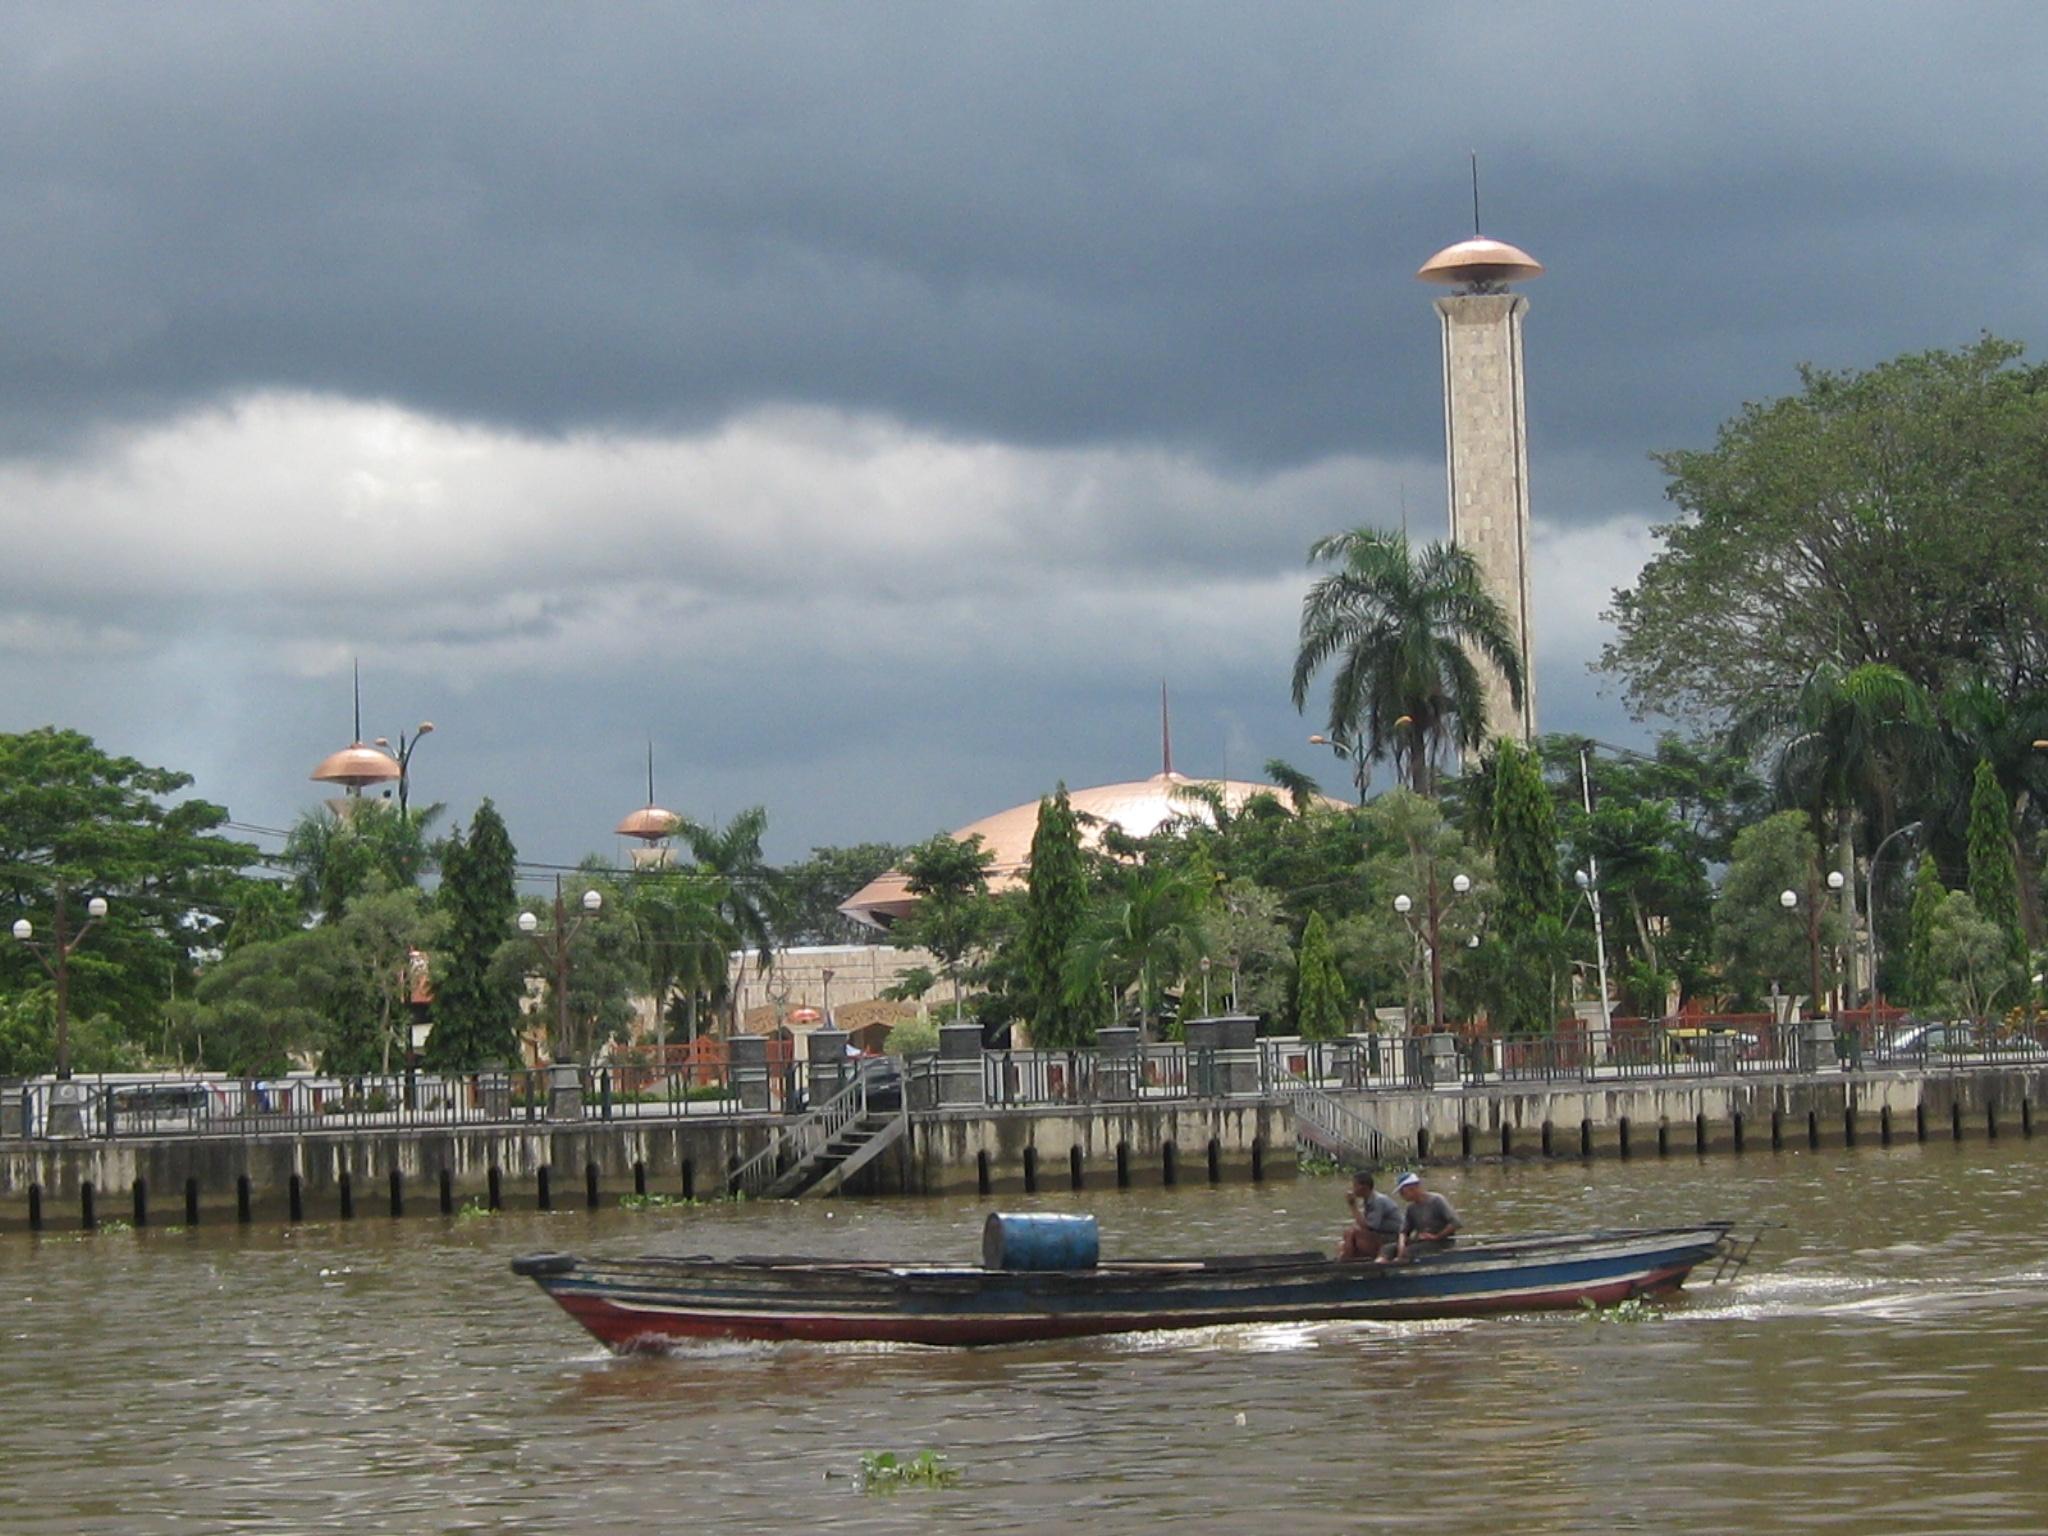 Membangun Ruang Publik Berbasis Budaya Sungai Ala Kota Banjarmasin Oleh